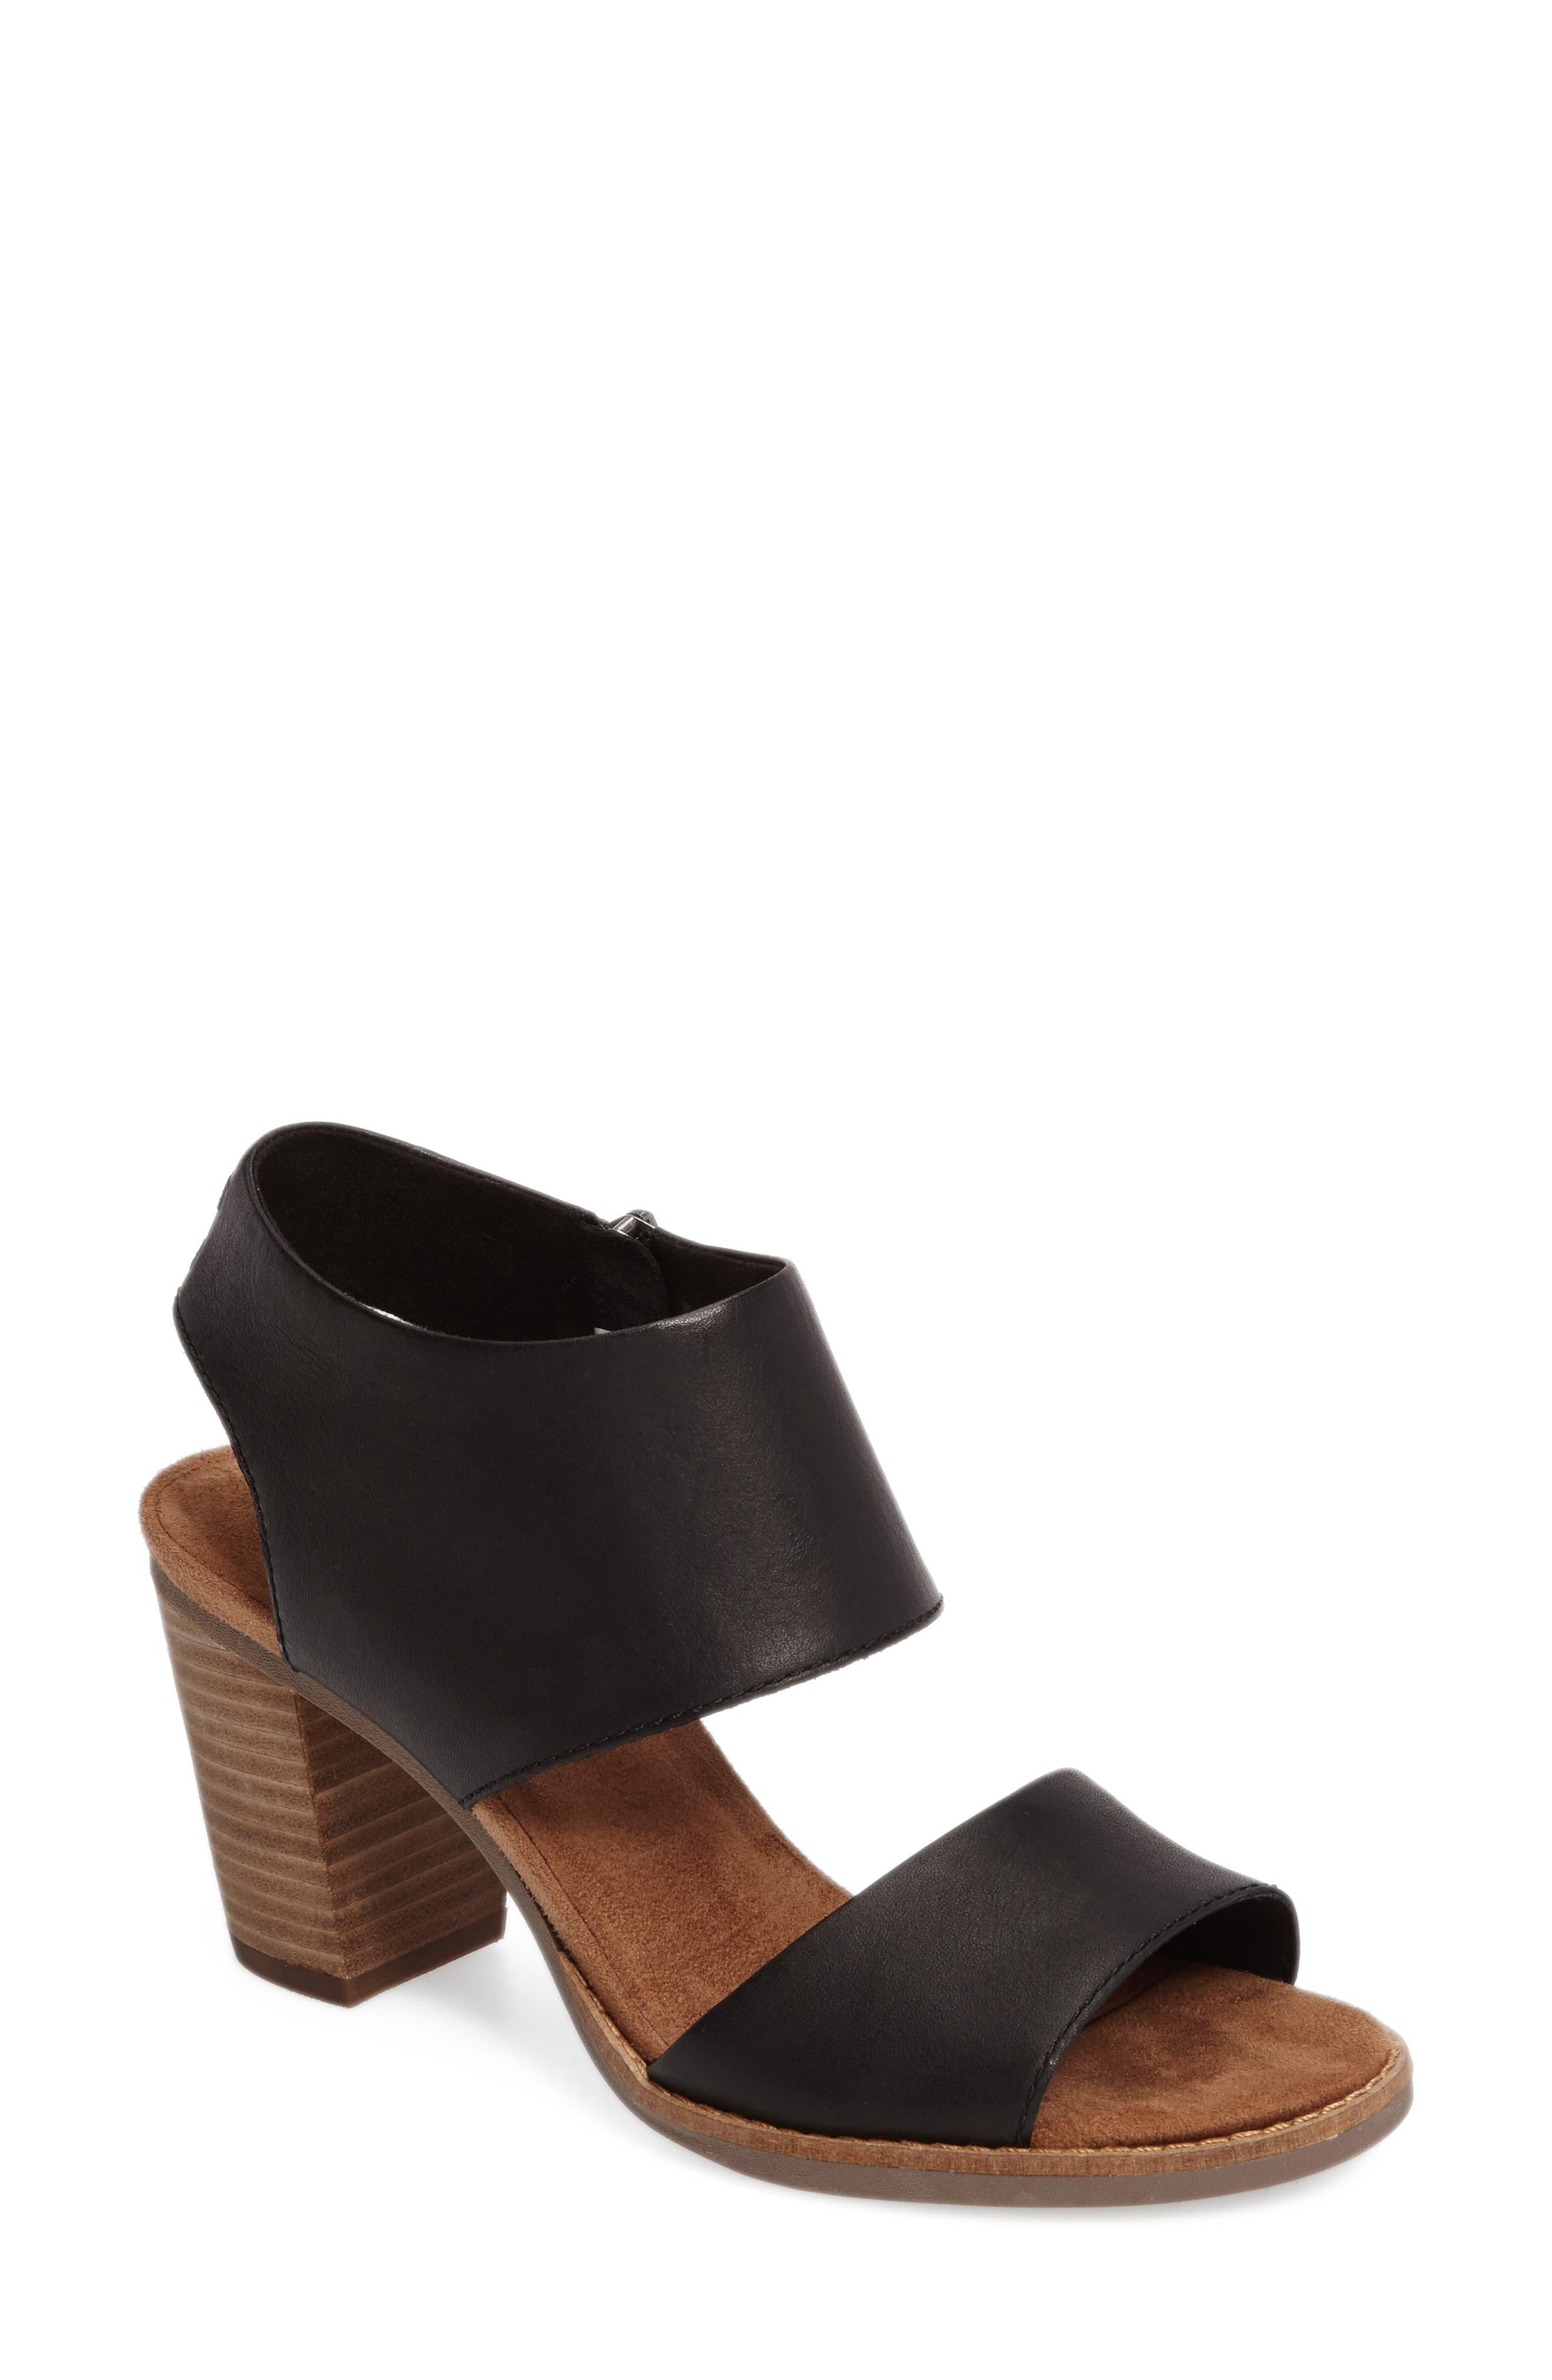 Majorca Sandal,                         Main,                         color, BLACK